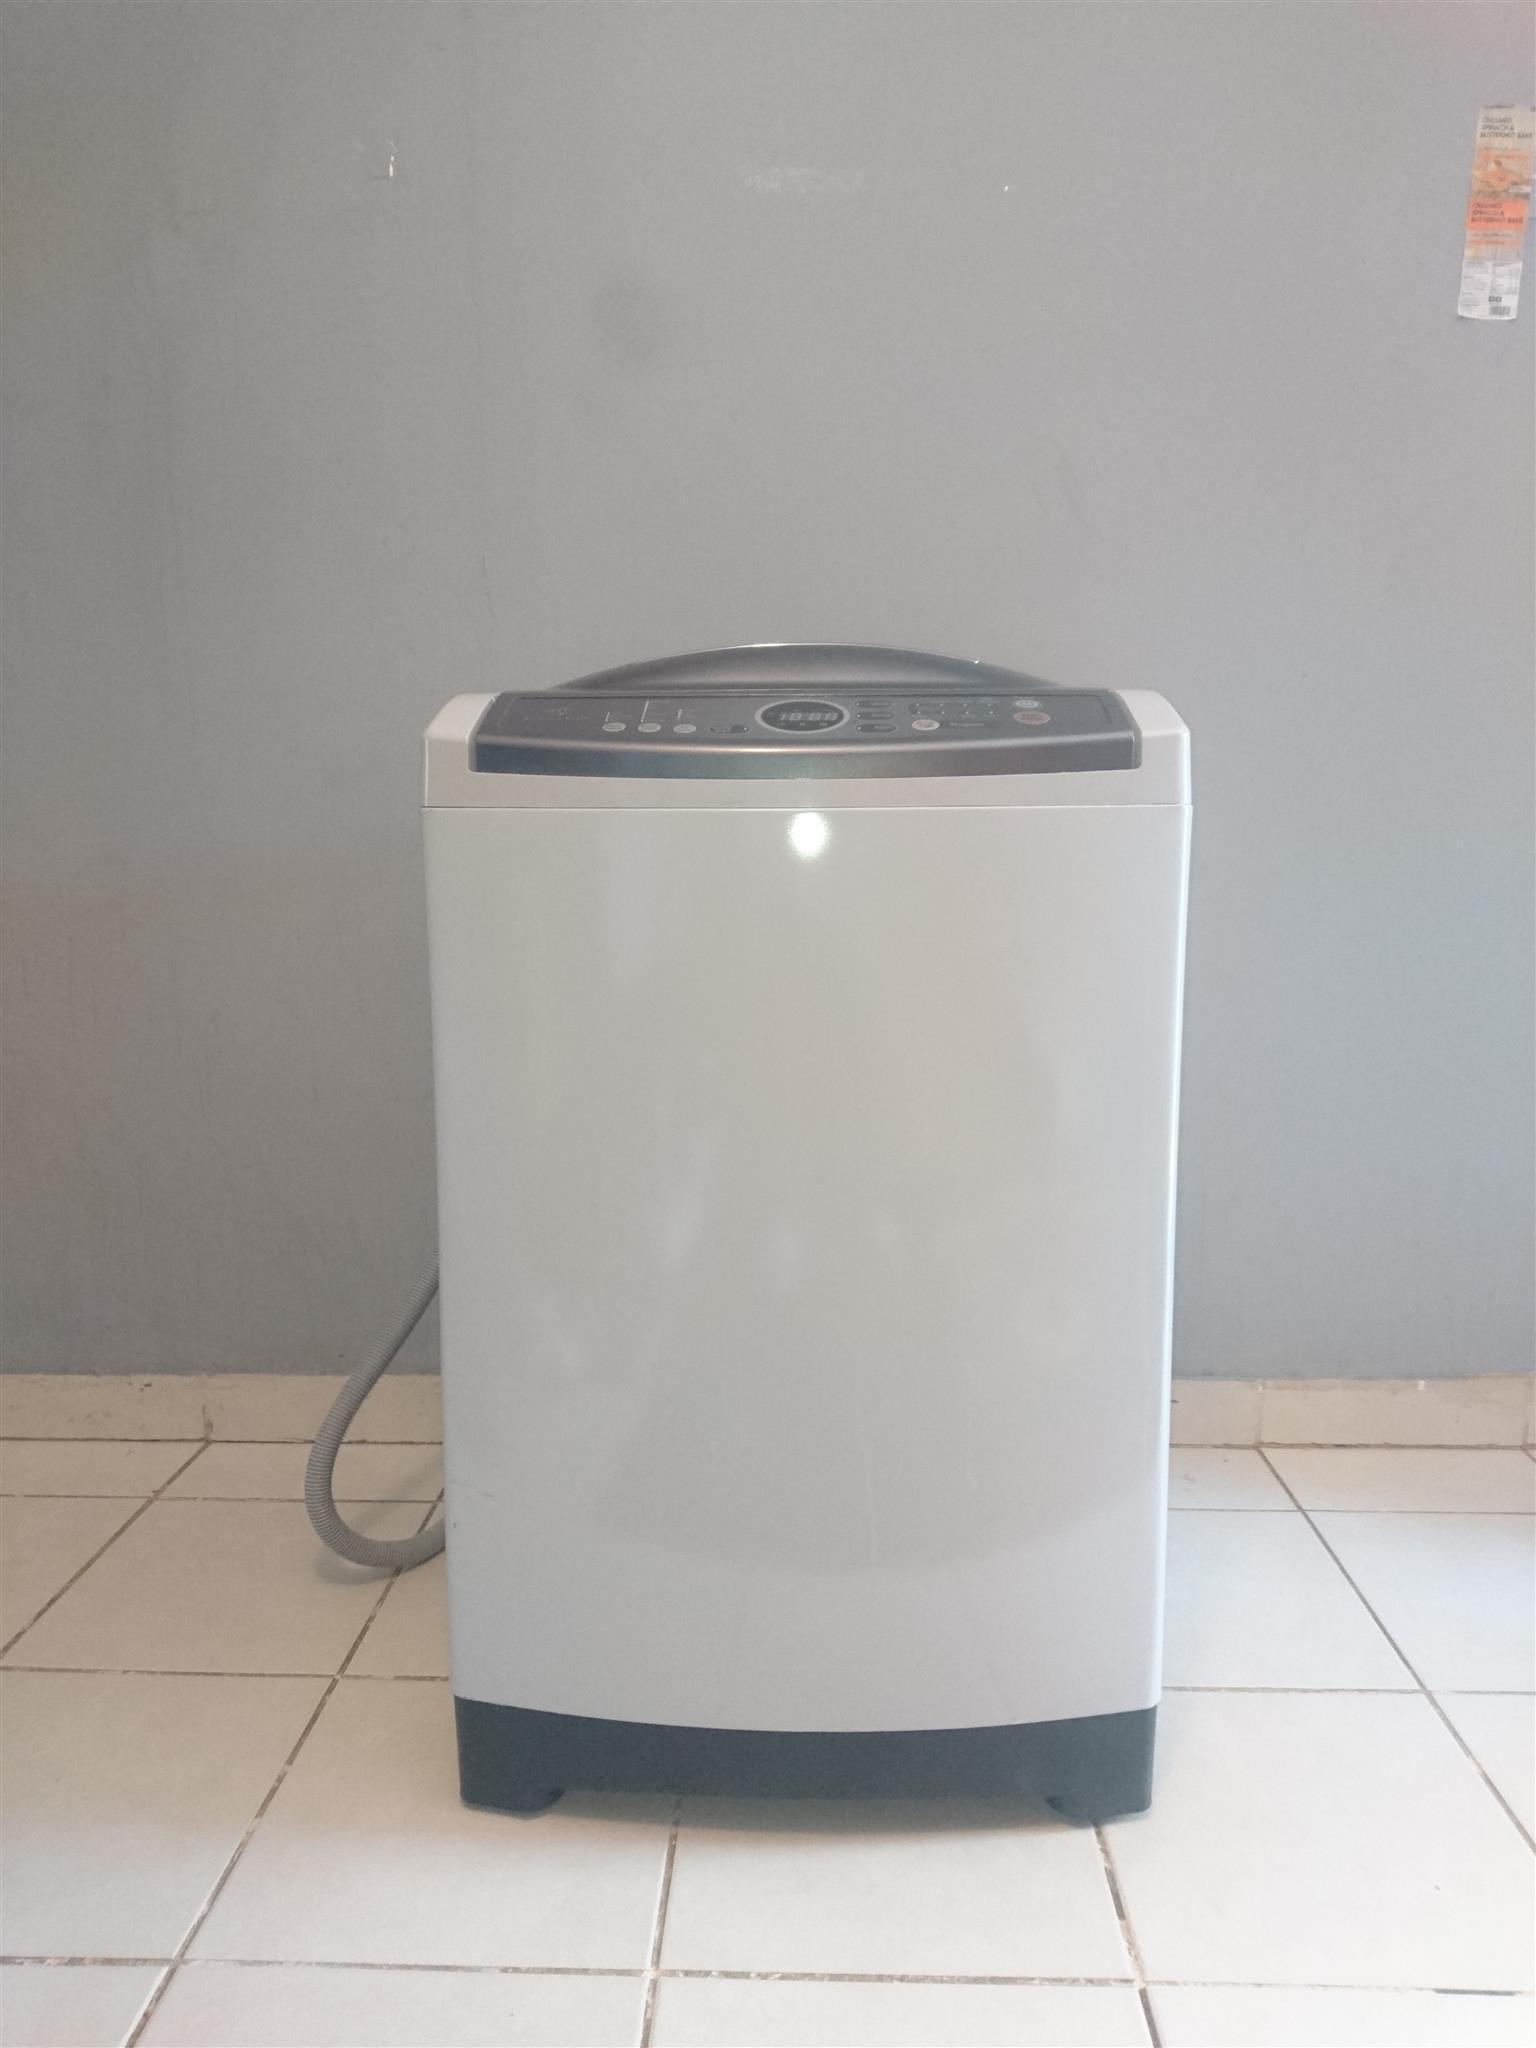 13kg diamond drum Metallic Samsung Washing machine